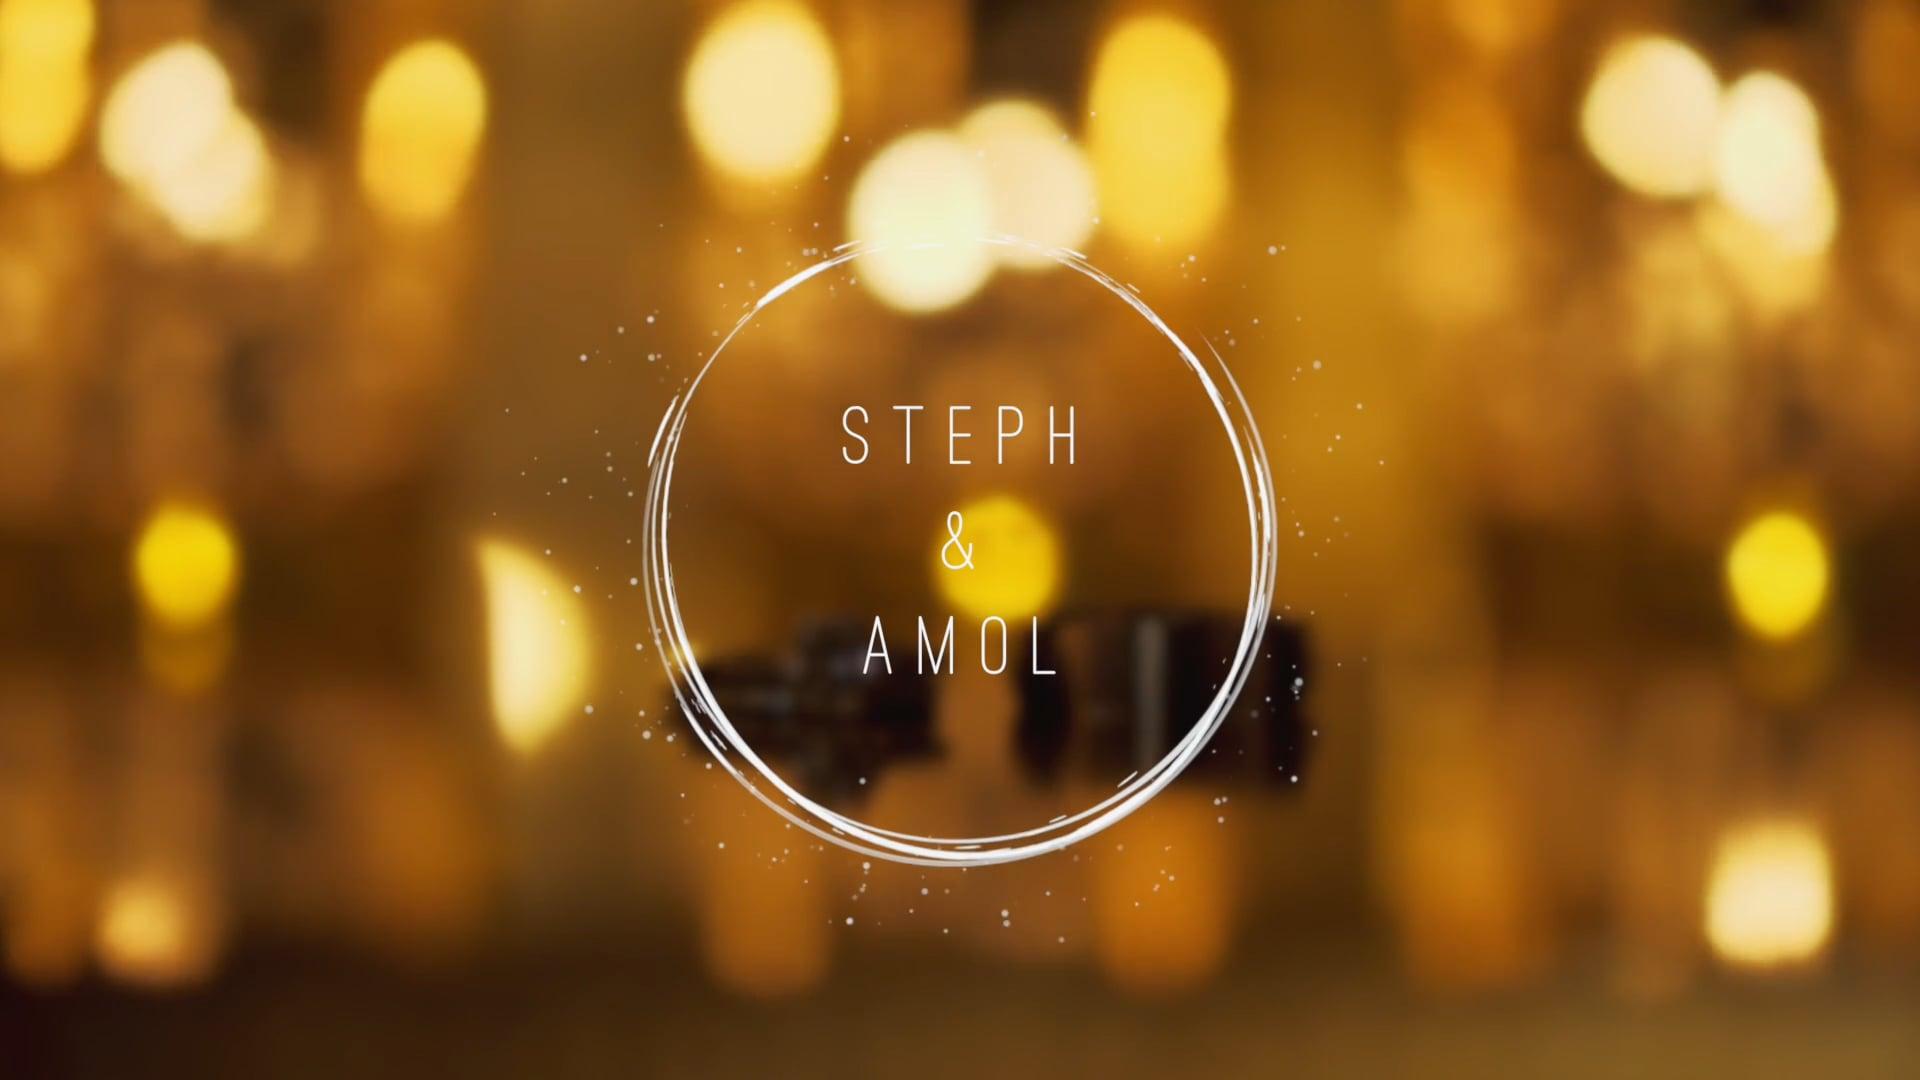 Stephanie & Amol -- Belvedere Hotel -- Baltimore Wedding